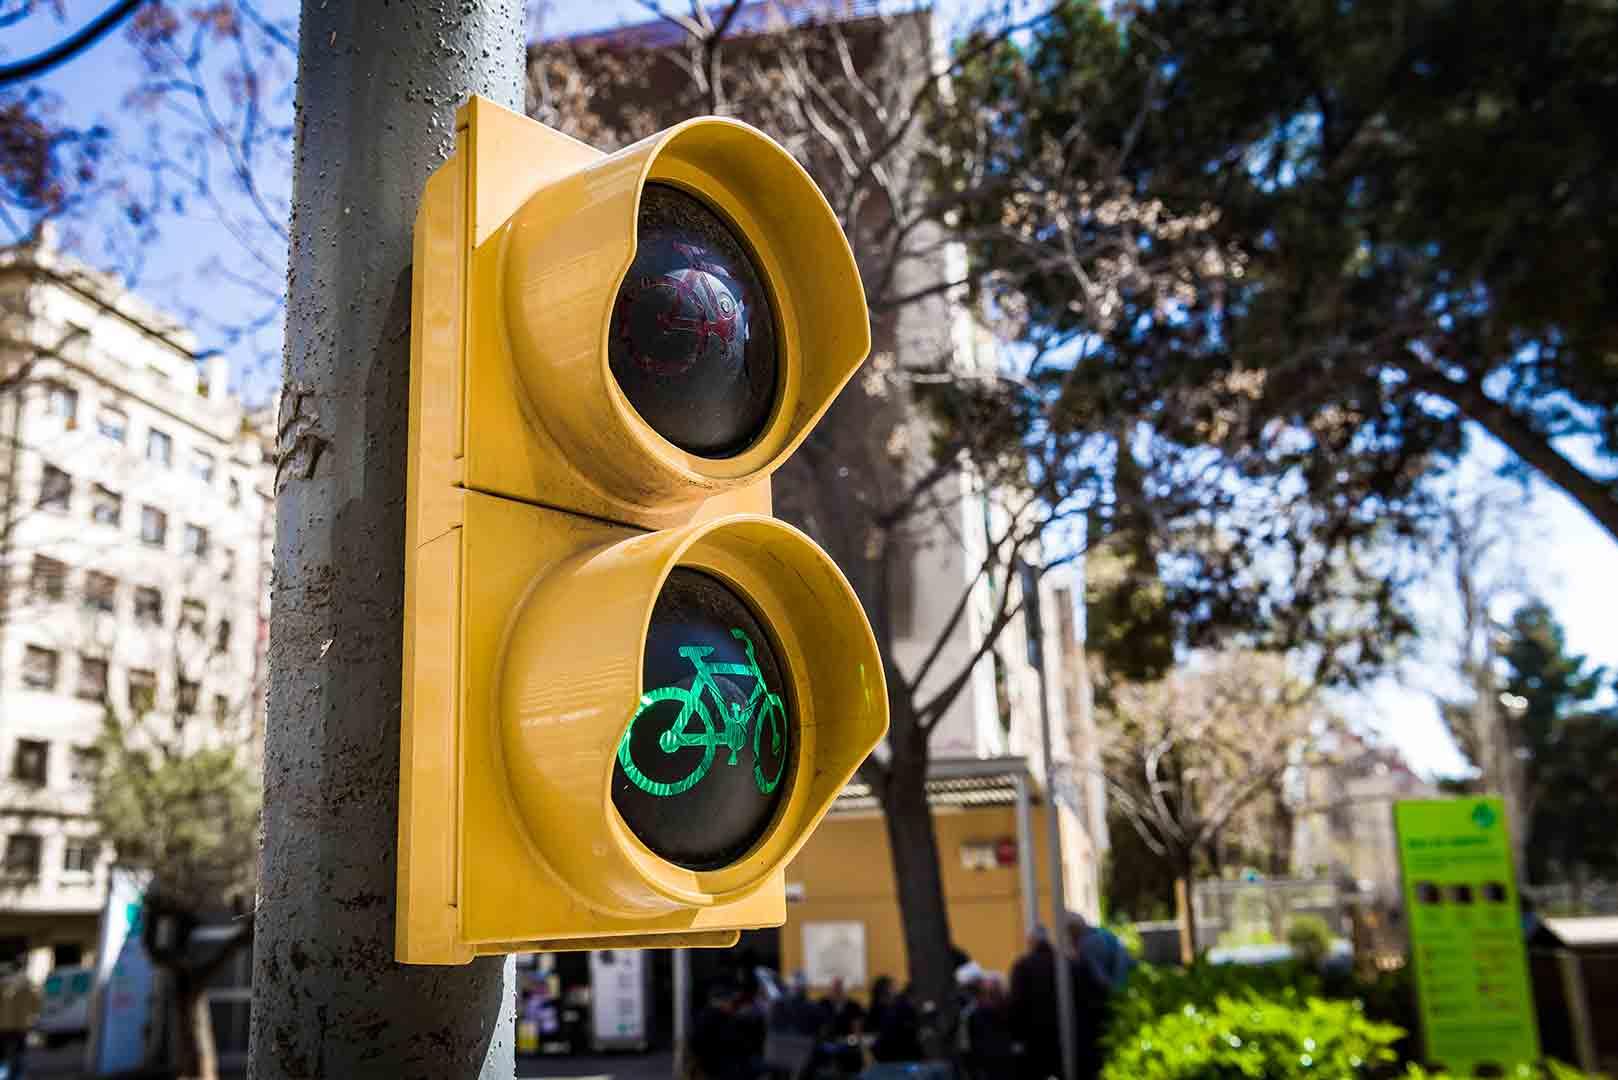 Spain Barcelona - Traffic lights cycling